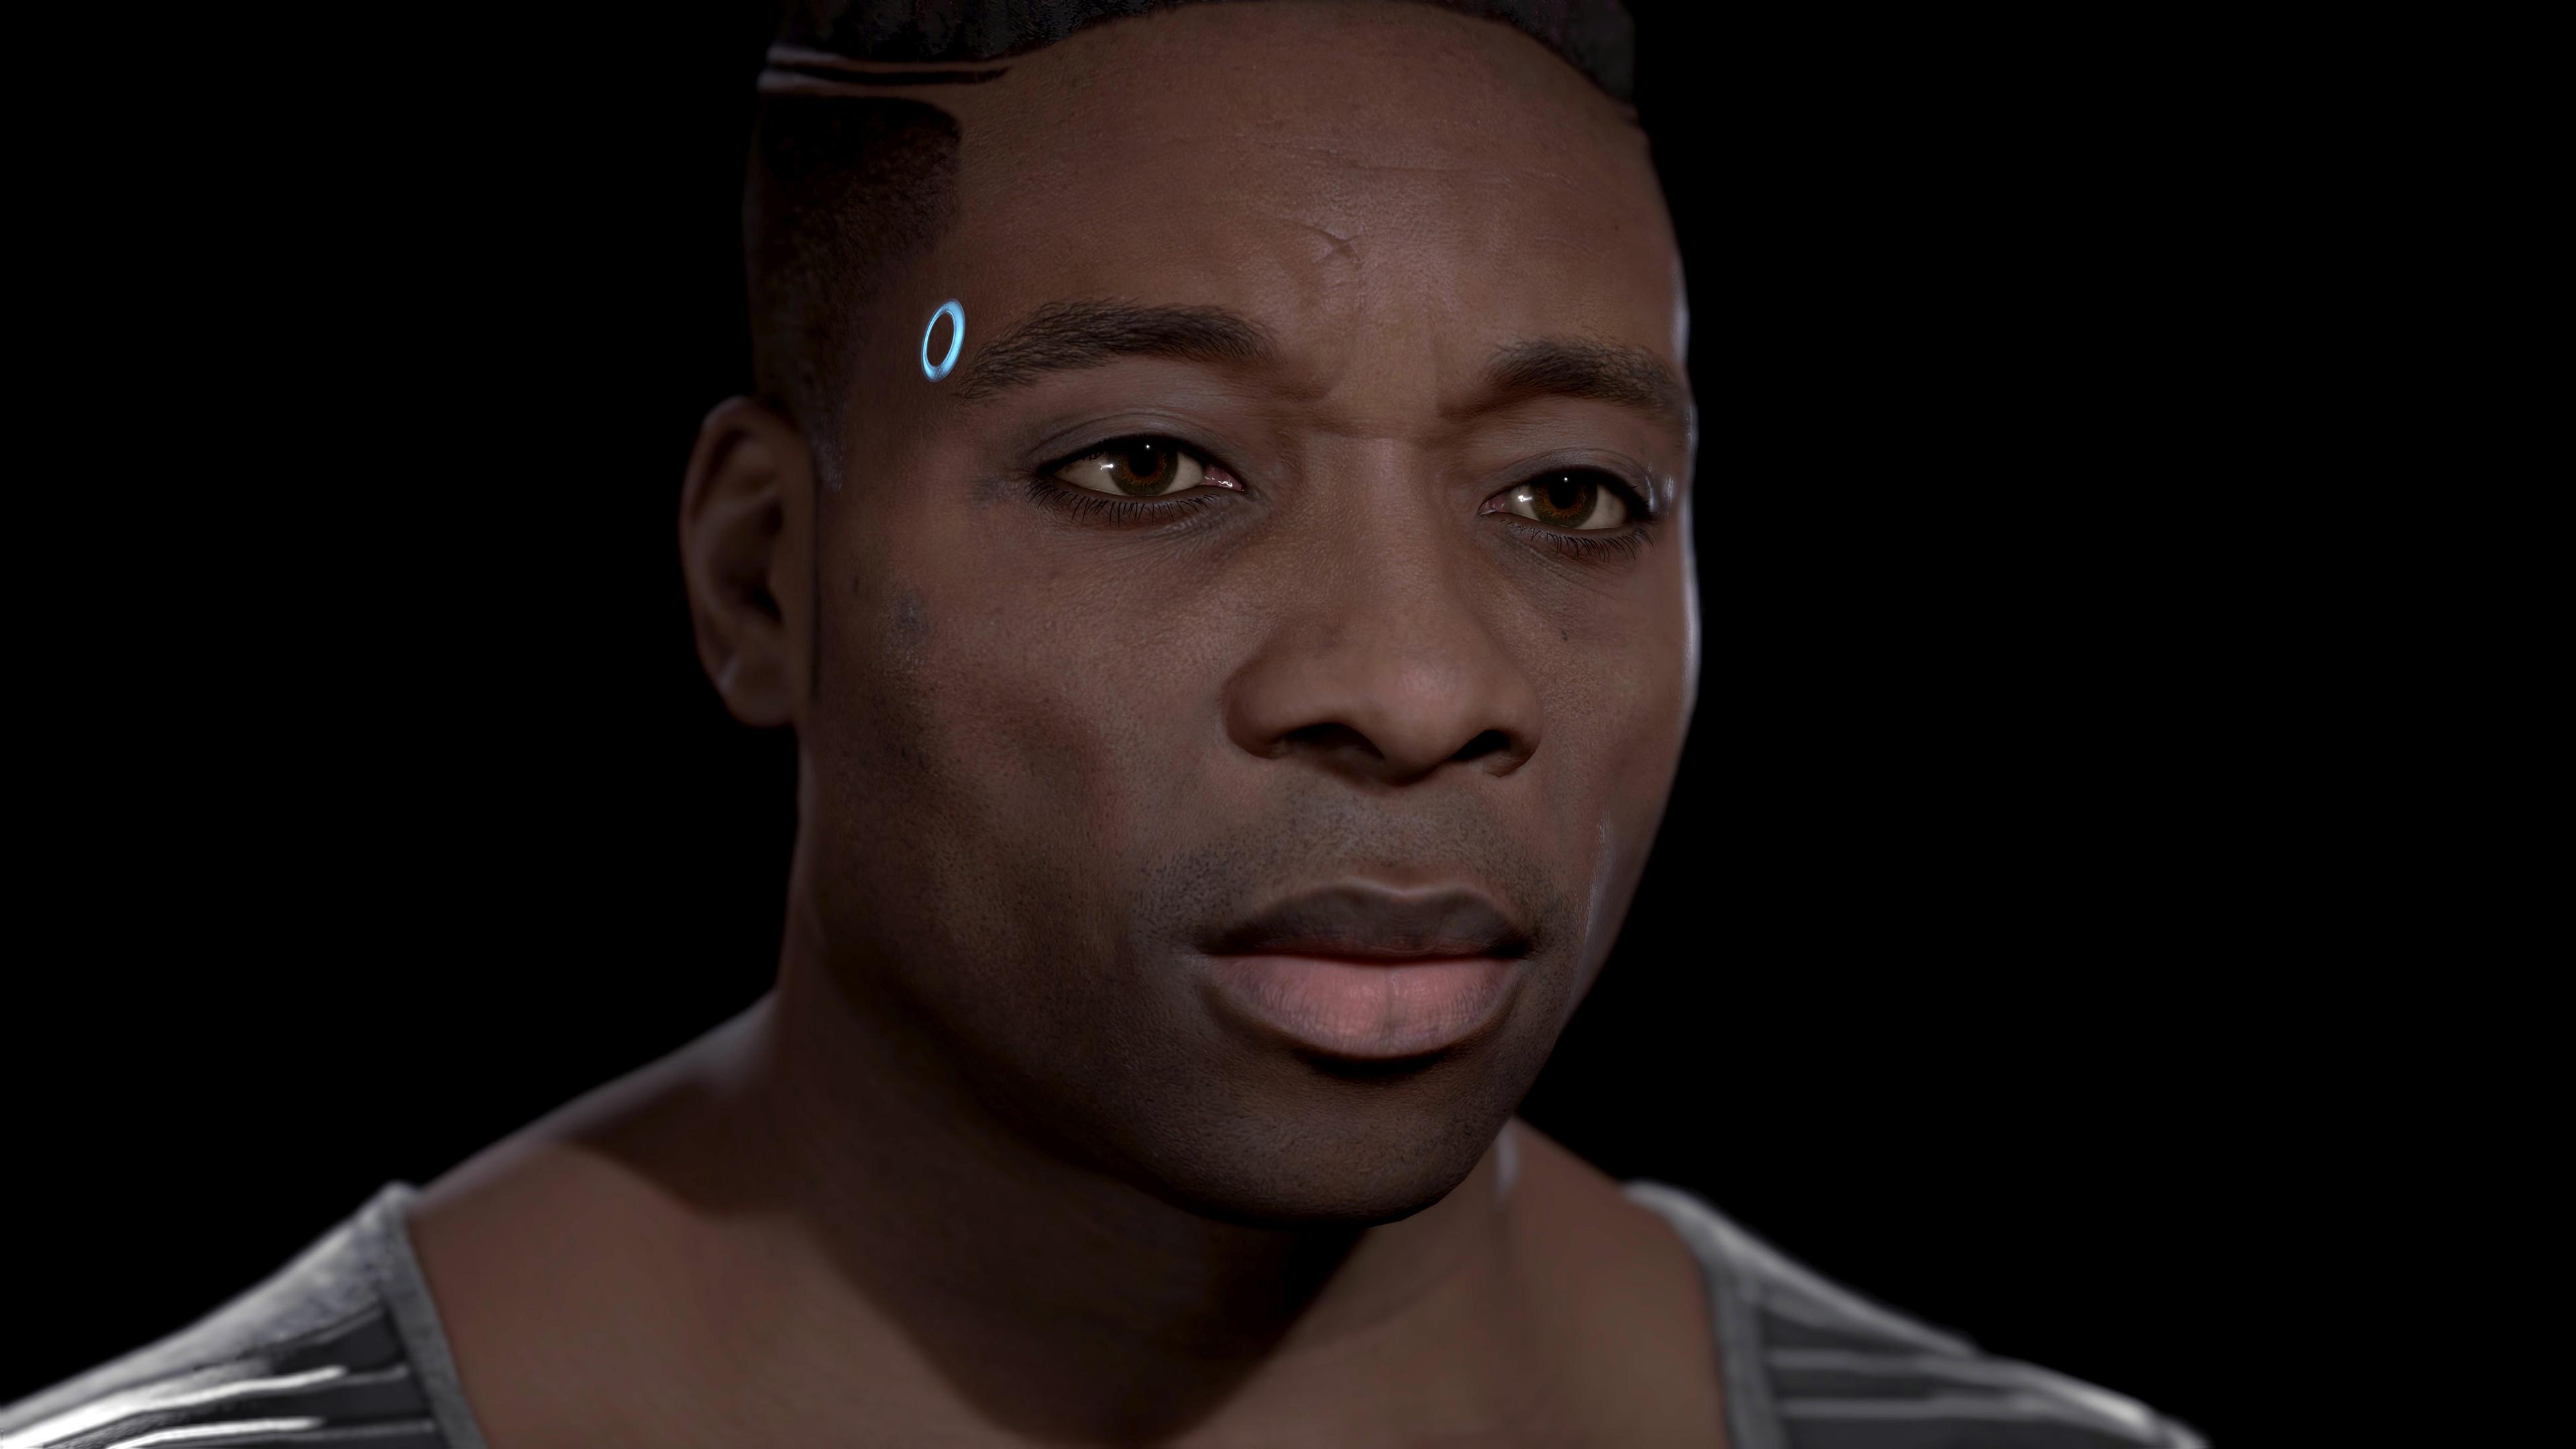 41469210554 1e008c00e3 o - Seht euch drei neue Kurzfilme an, die den Rahmen für den PS4-Exklusivtitel Detroit: Become Human abstecken